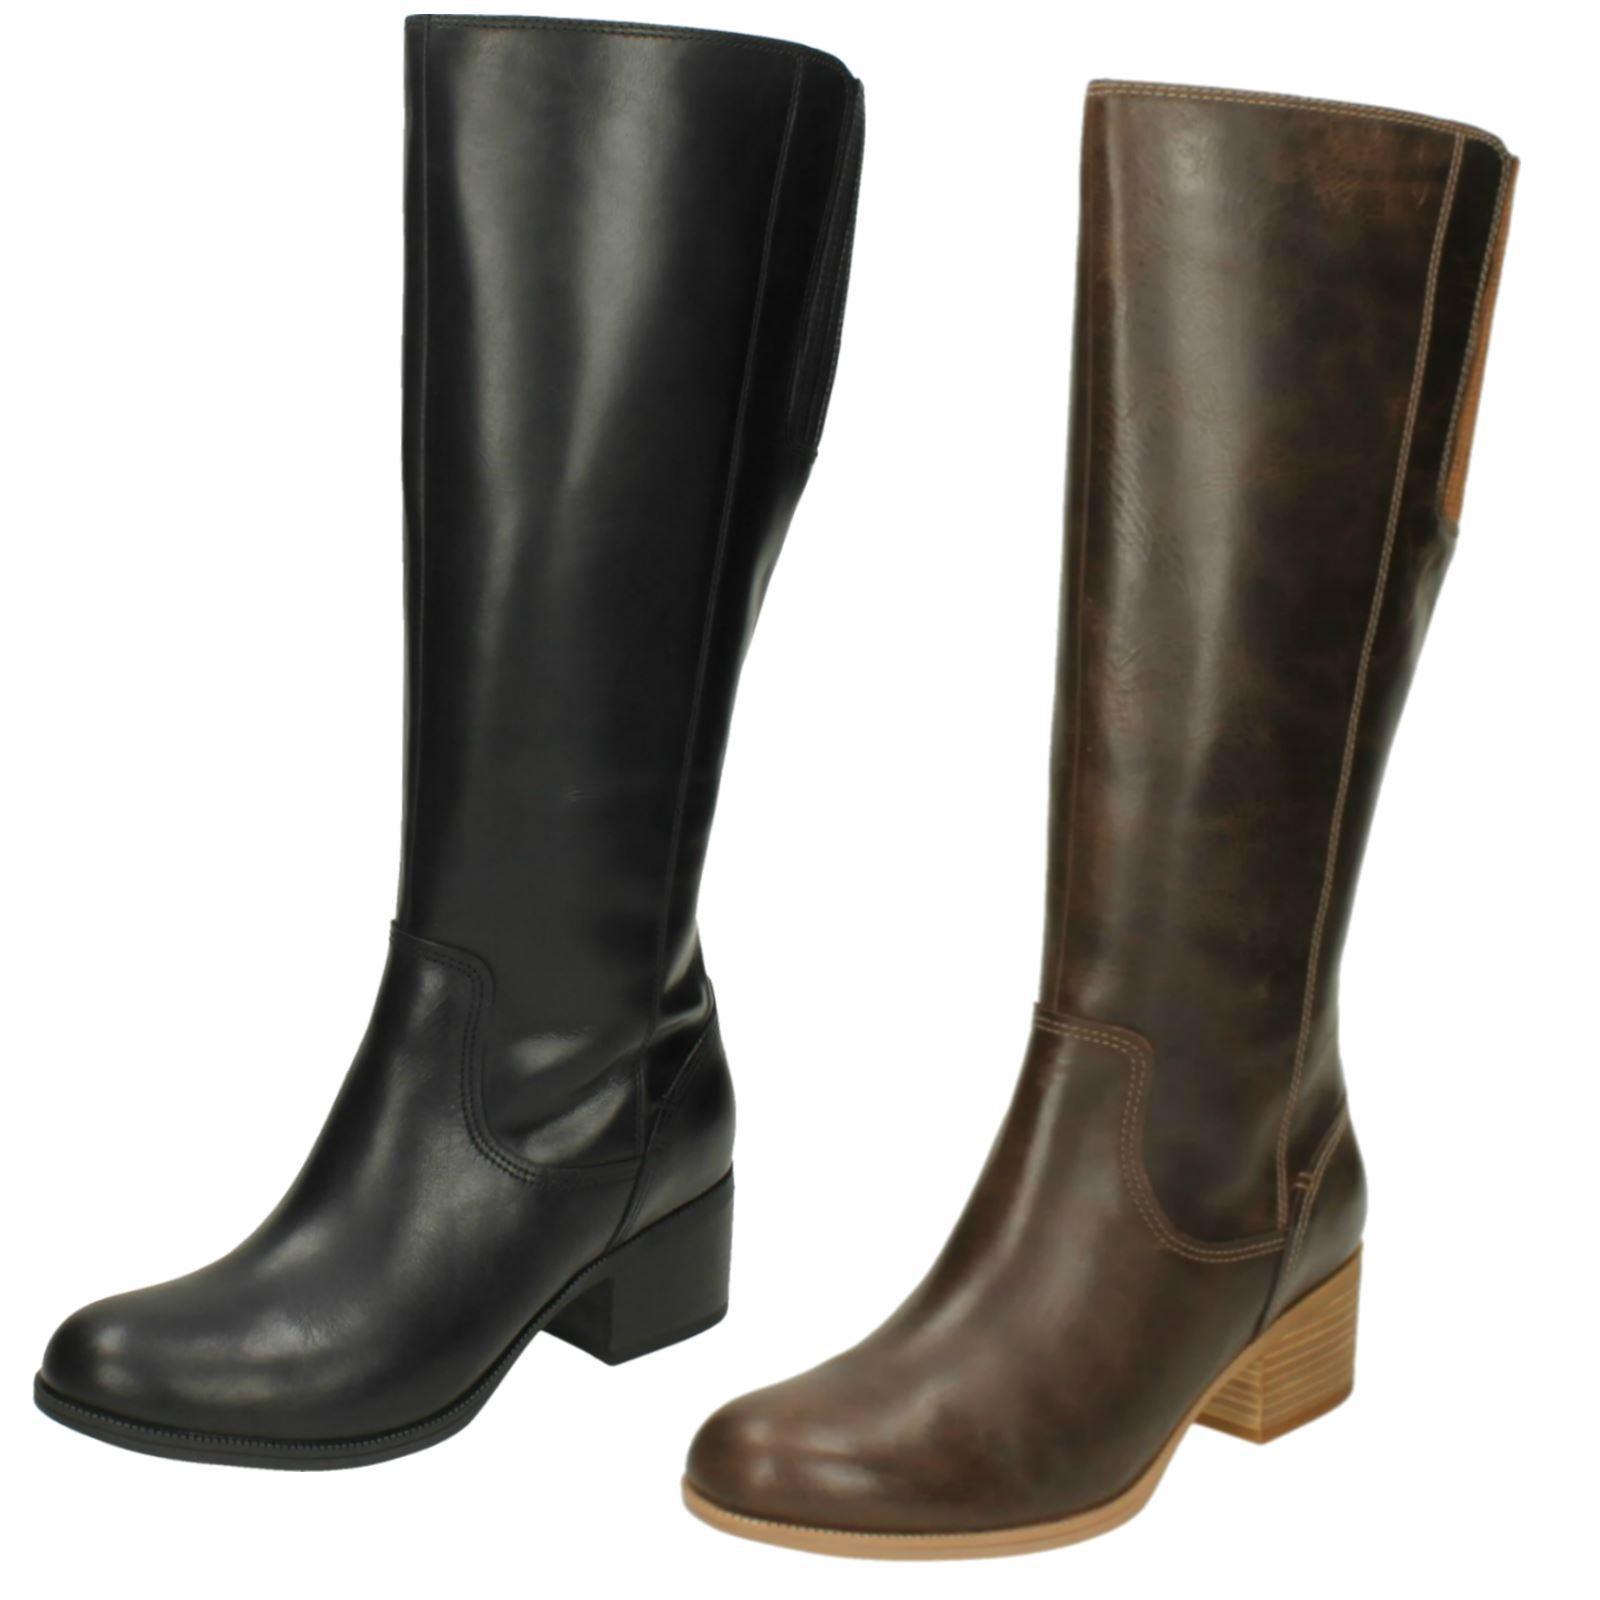 Ladies Clarks Knee Length Heeled Boots 'Maypearl purple'